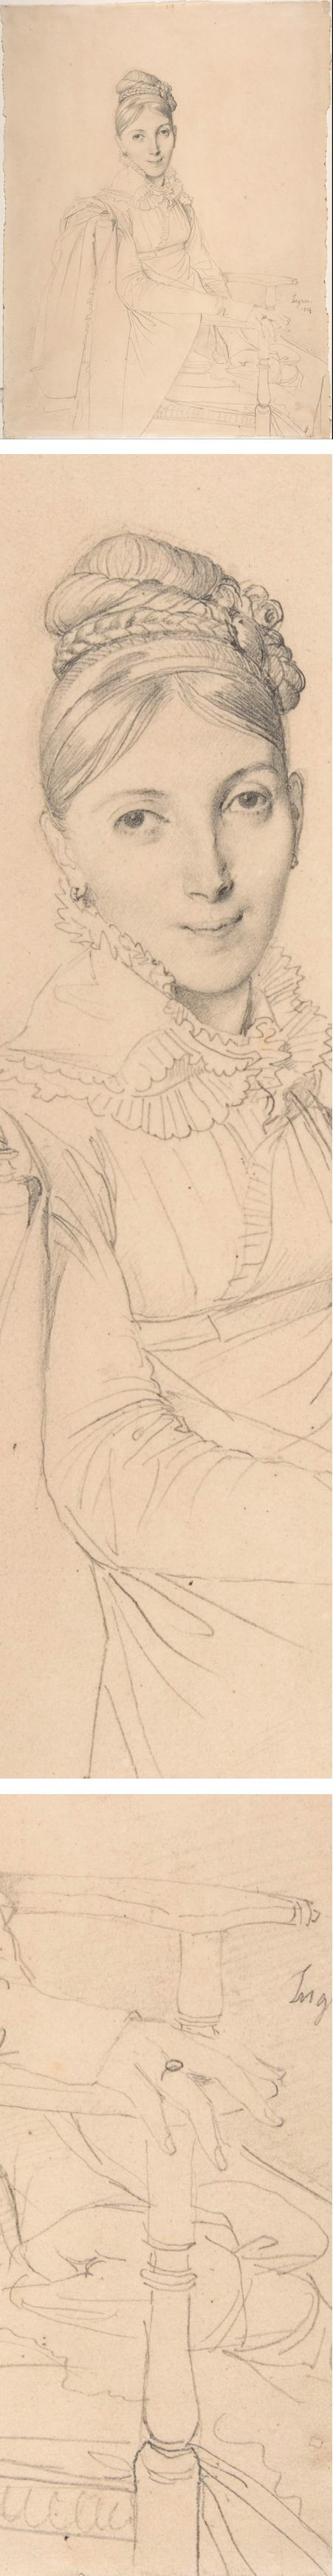 Portrait of a Seated Lady, Jean Auguste Dominique Ingres, pencil portrait drawing